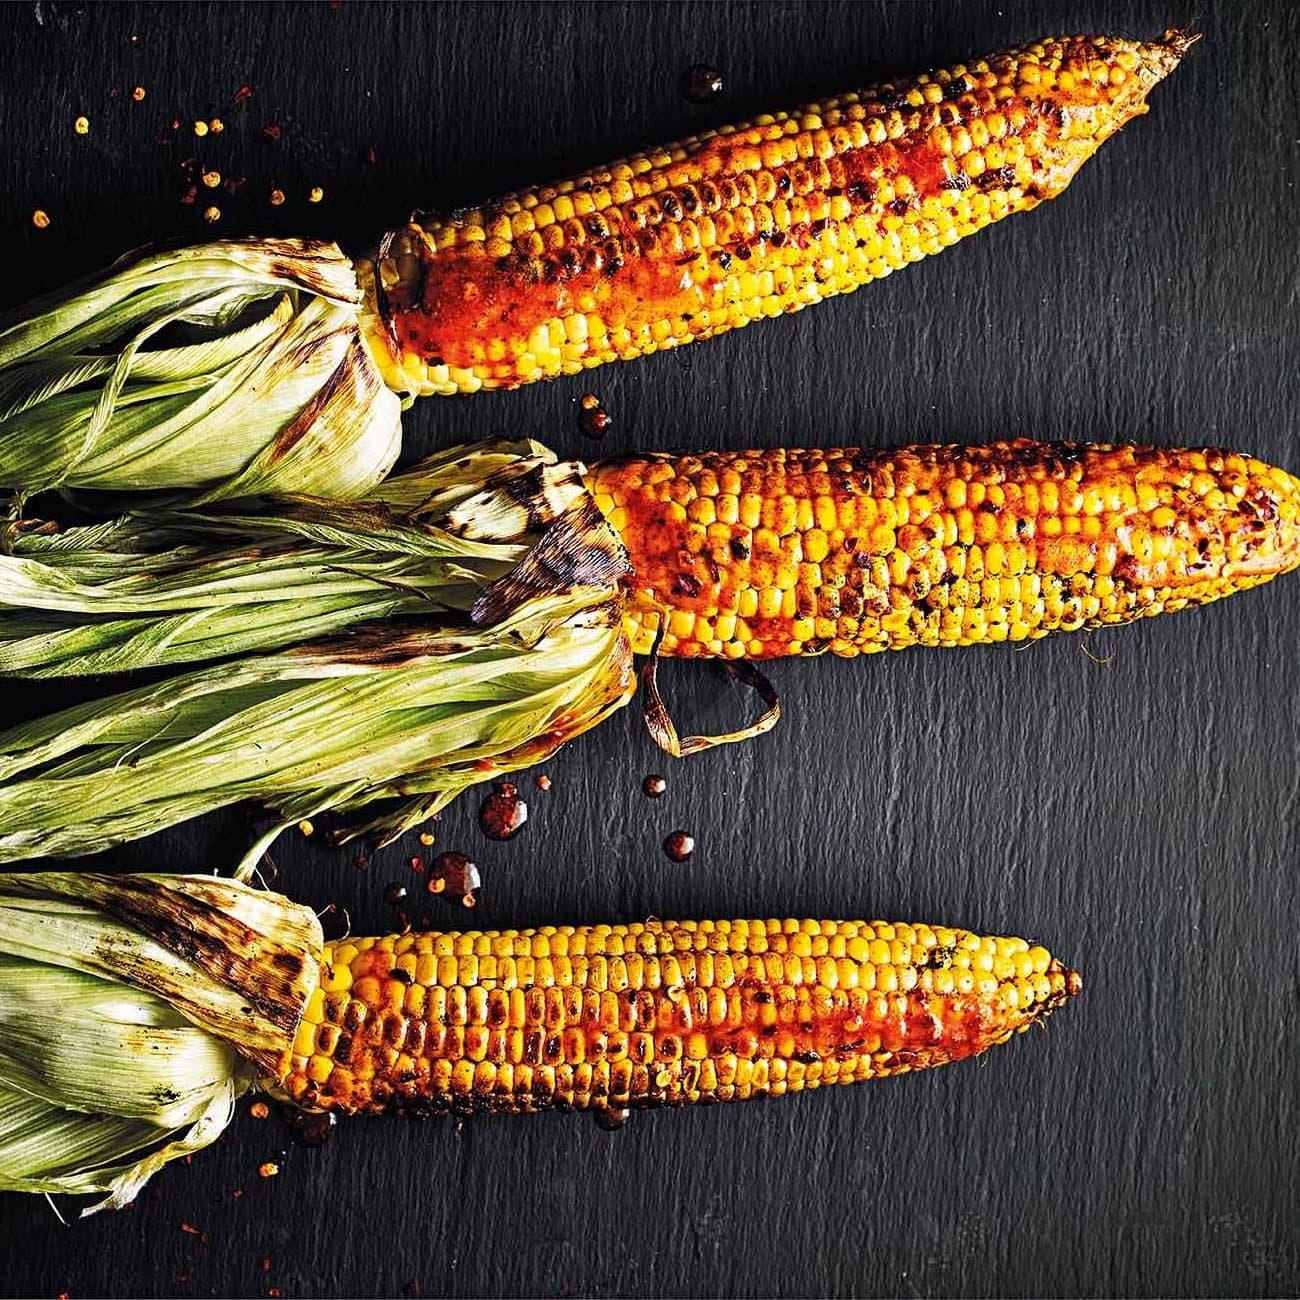 Photo of Firecracker corn on the cob by WW